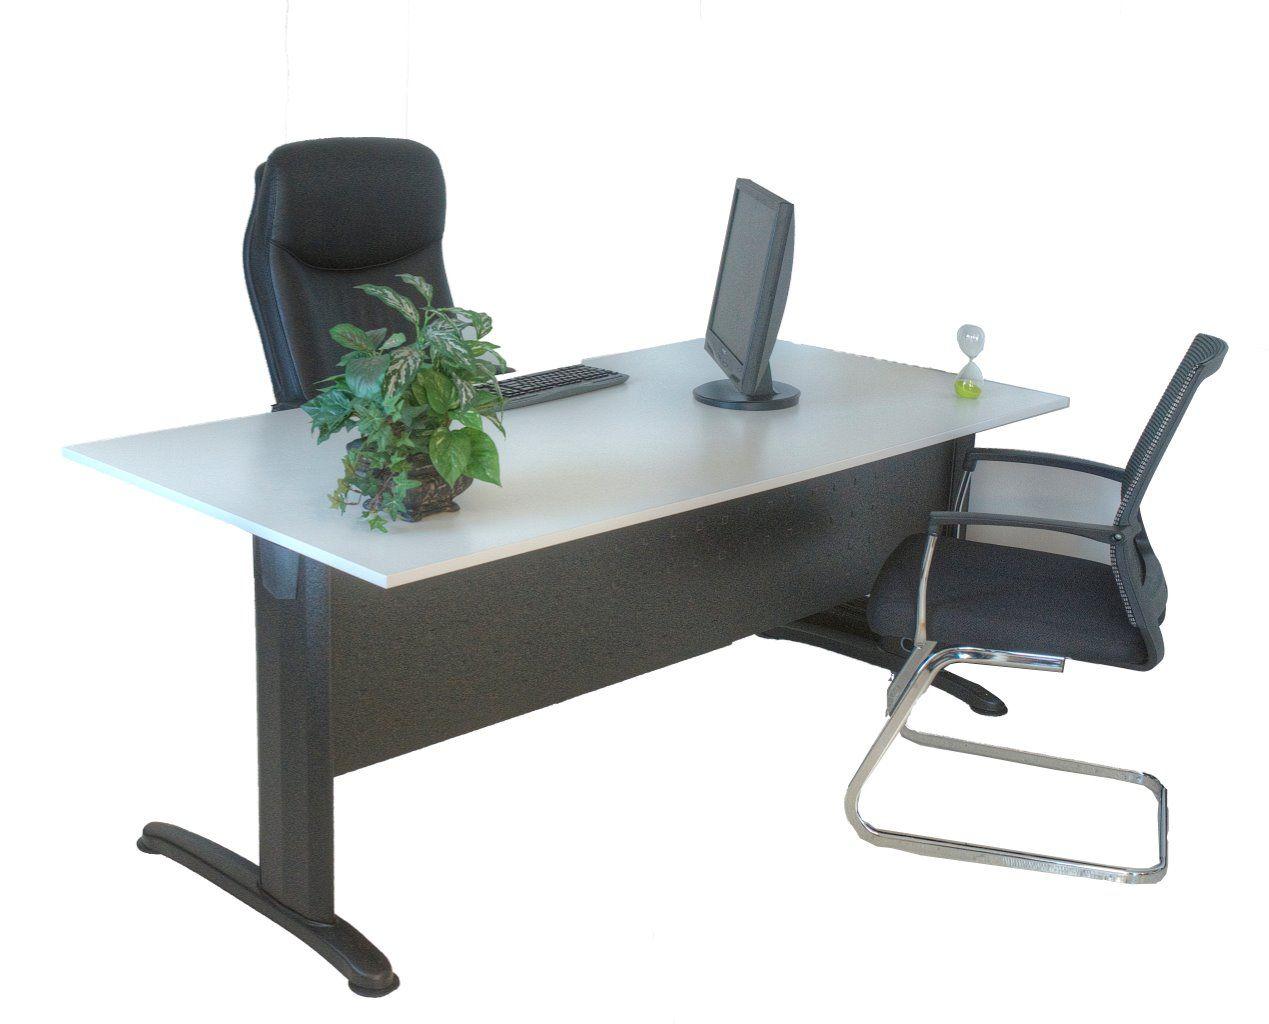 36x72 Table Desk Http Www Newlifeoffice Com Products 36 X 72